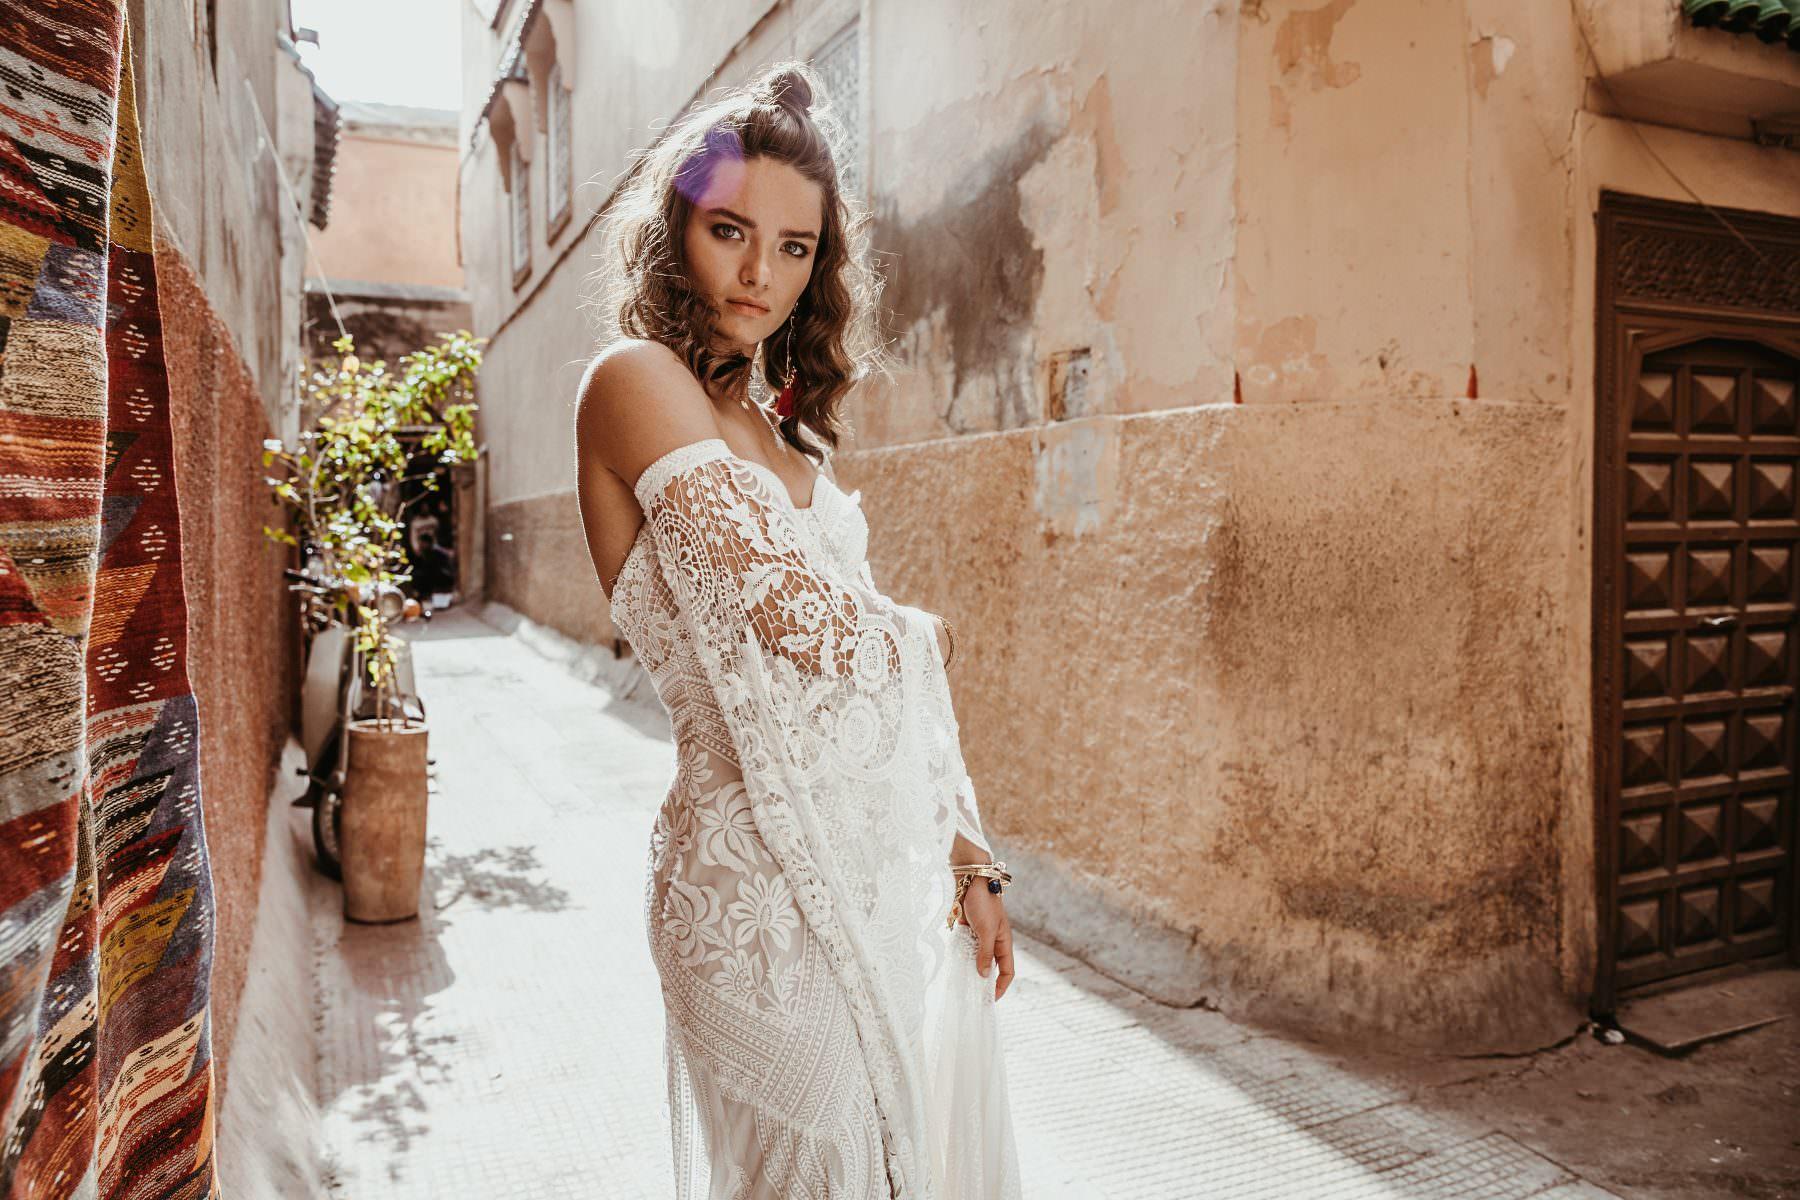 Rue De Seine Adara Wildhearts wedding dress bridal shop store gowns christchurch wellington